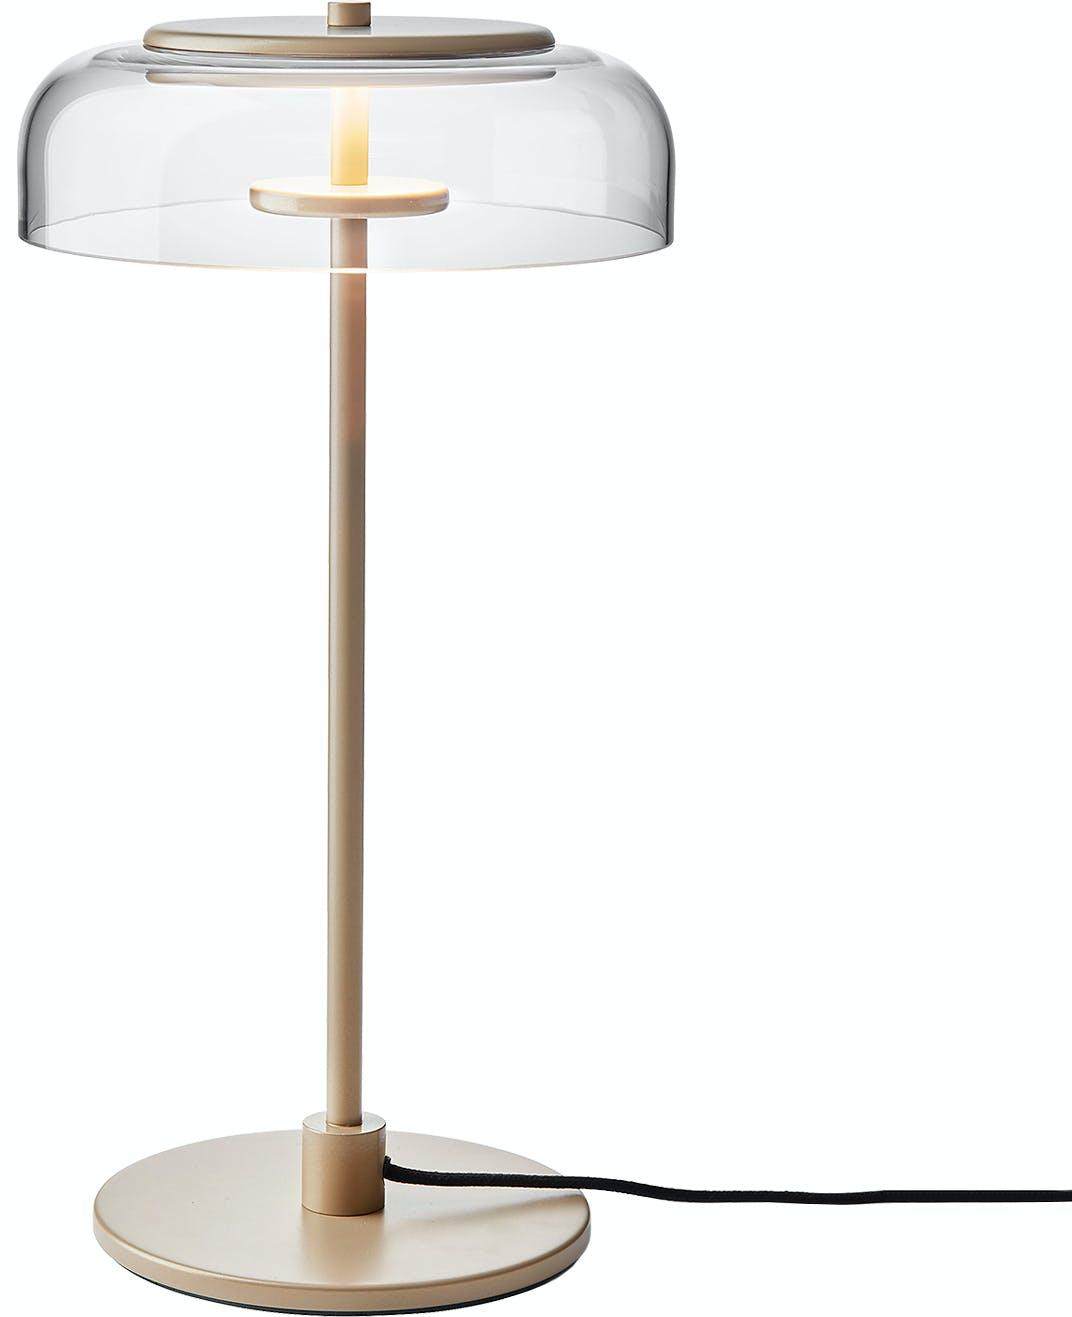 Nuura Blossi Table Lamp Thumbnail Haute Living